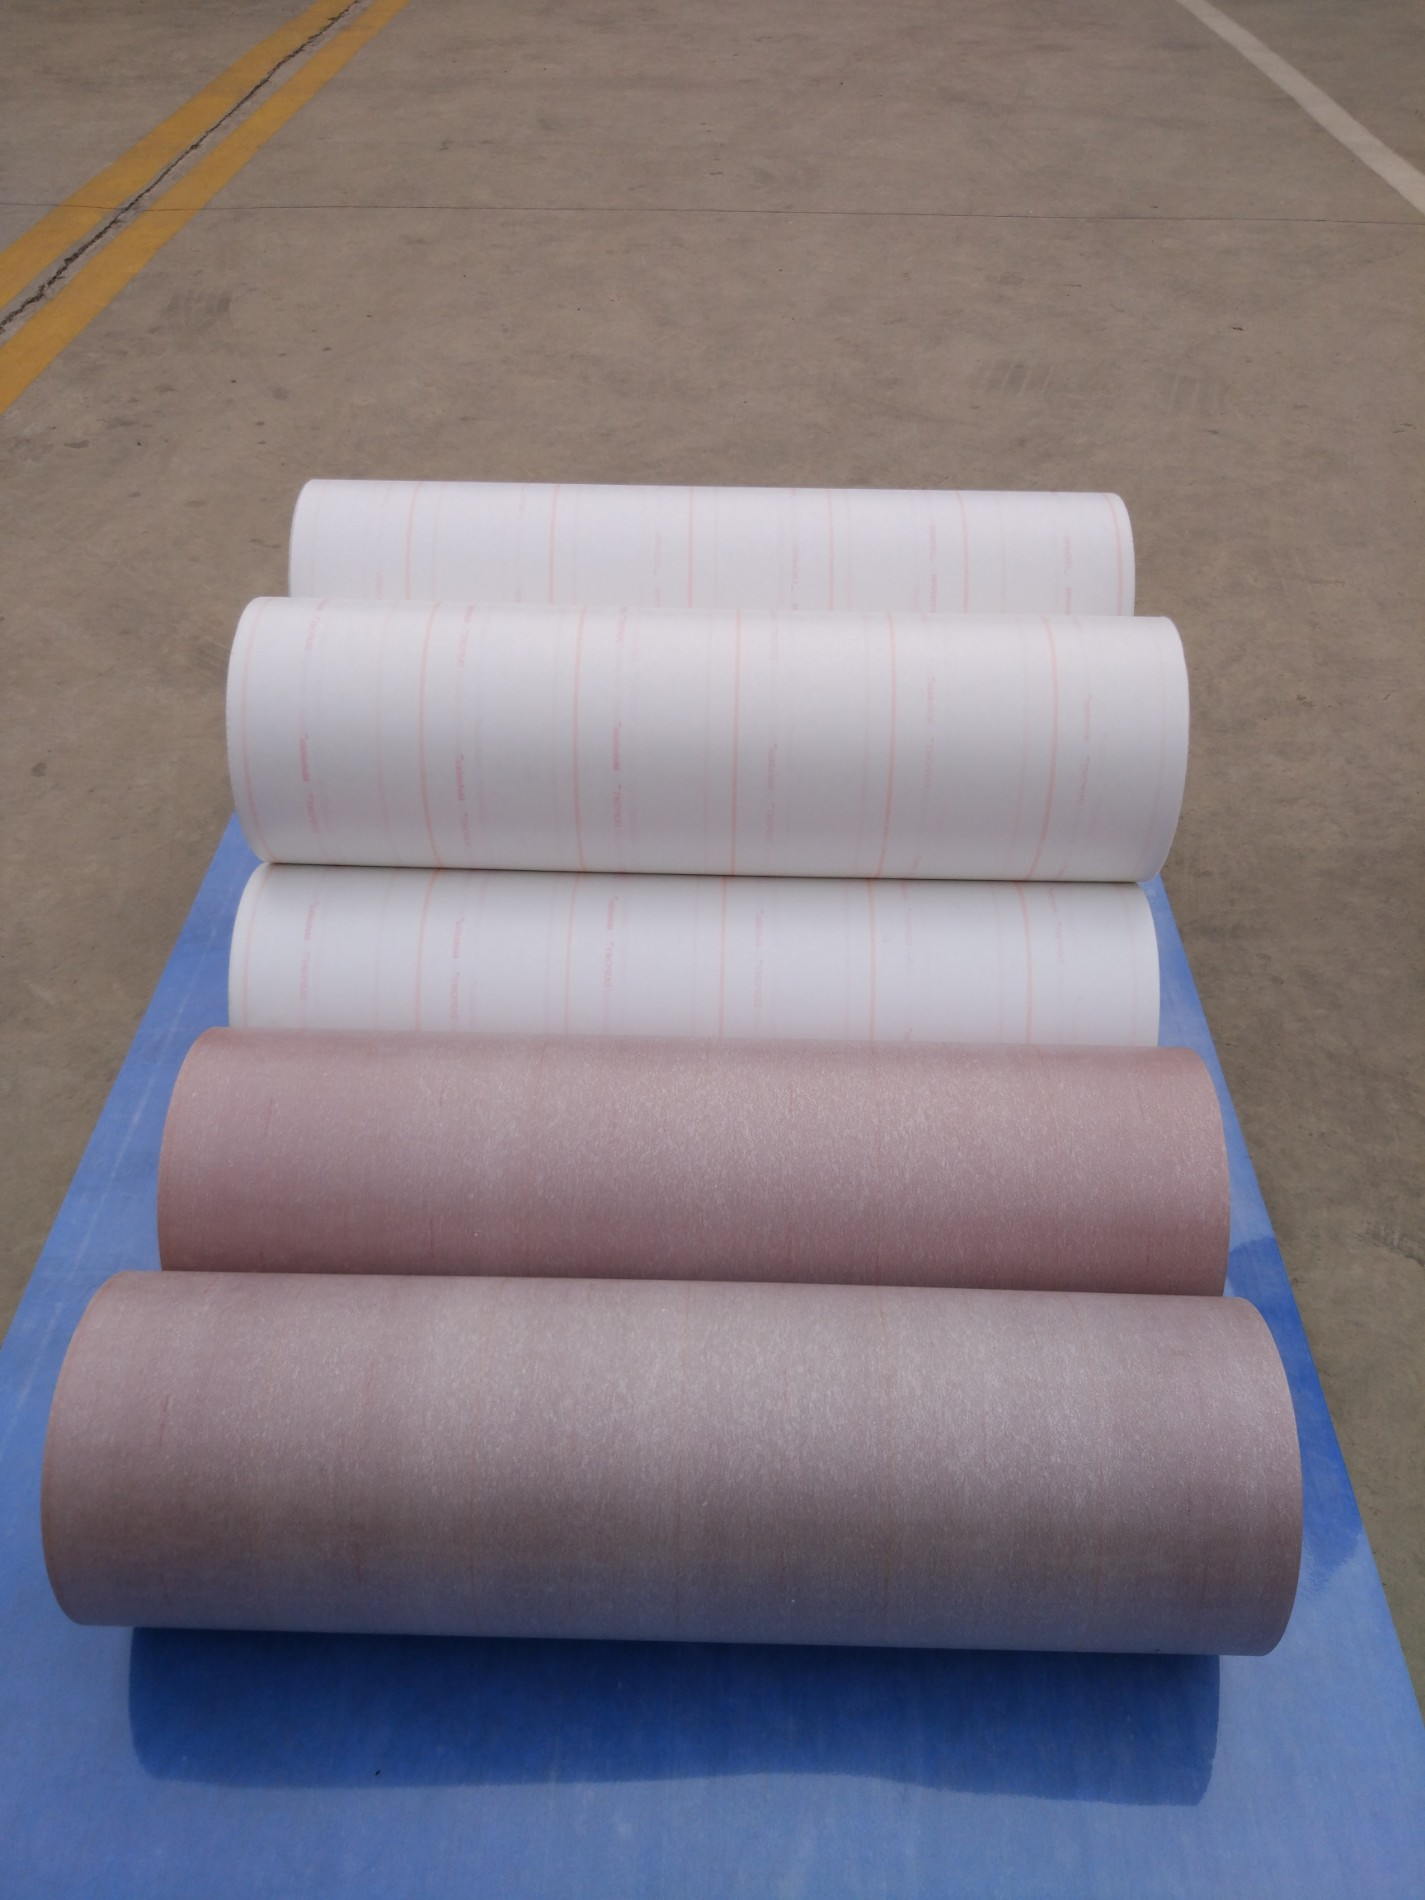 polyamide film NHN insulation paper